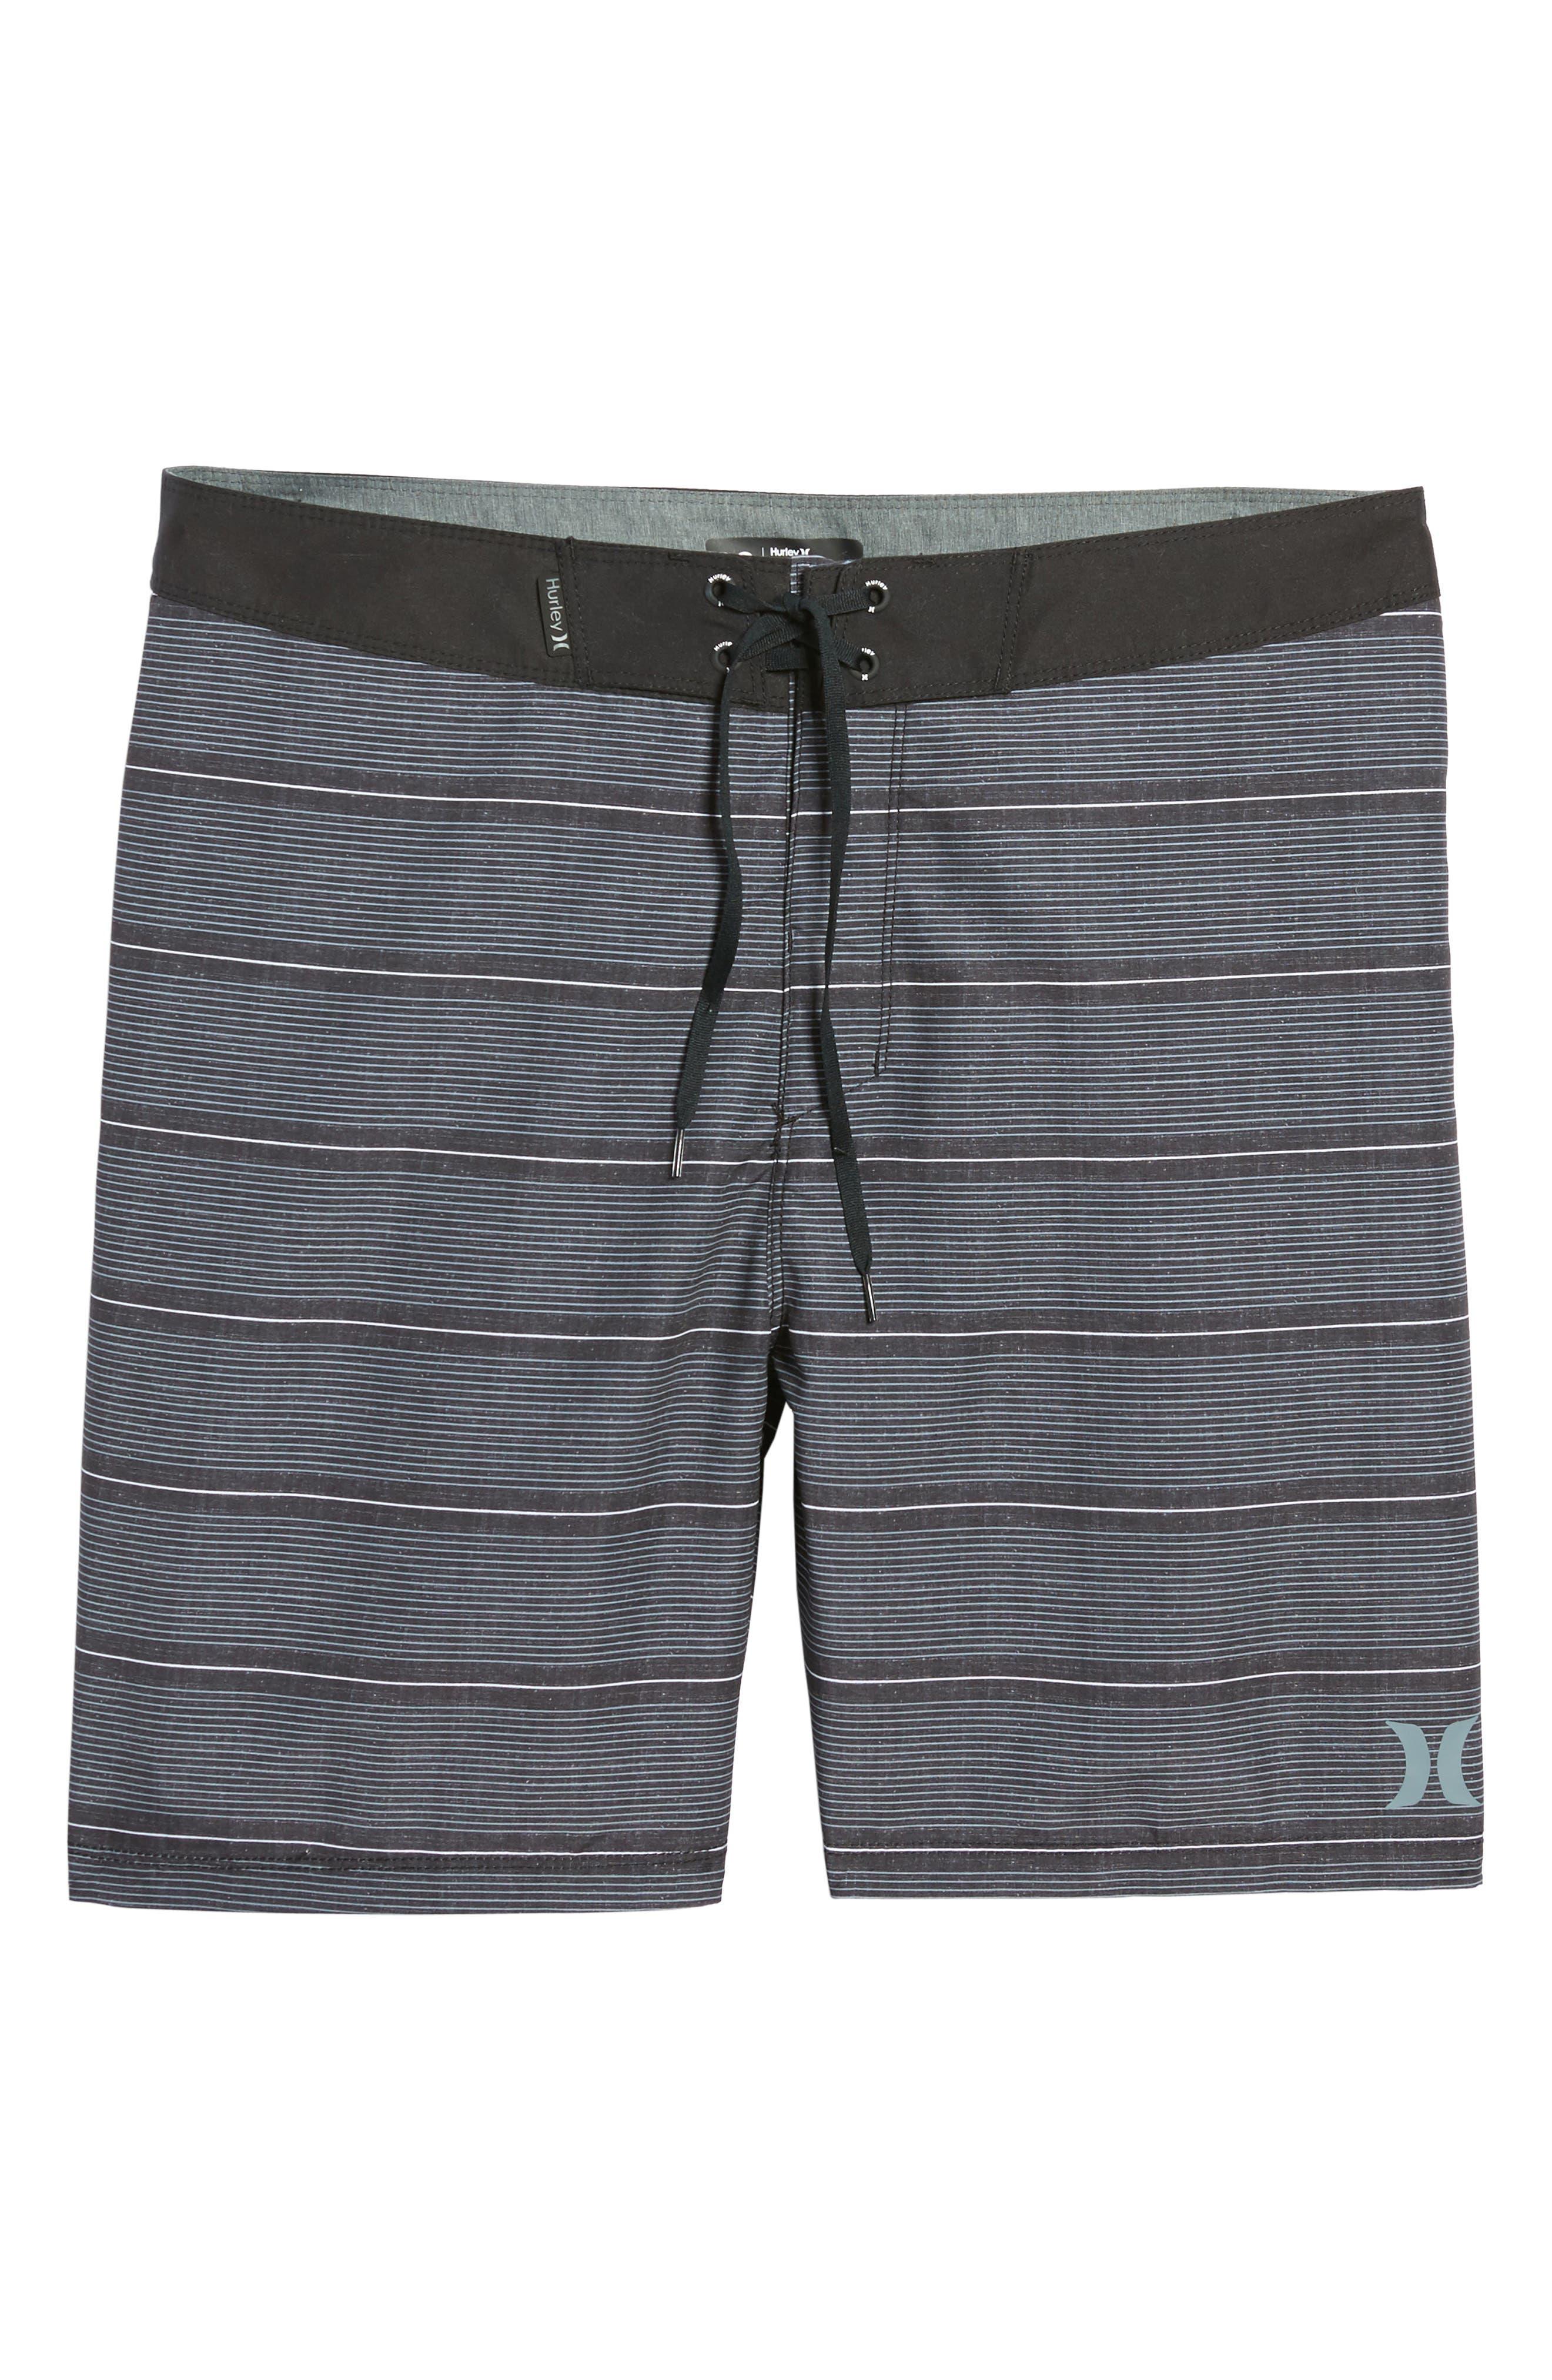 Shoreside Board Shorts,                             Alternate thumbnail 11, color,